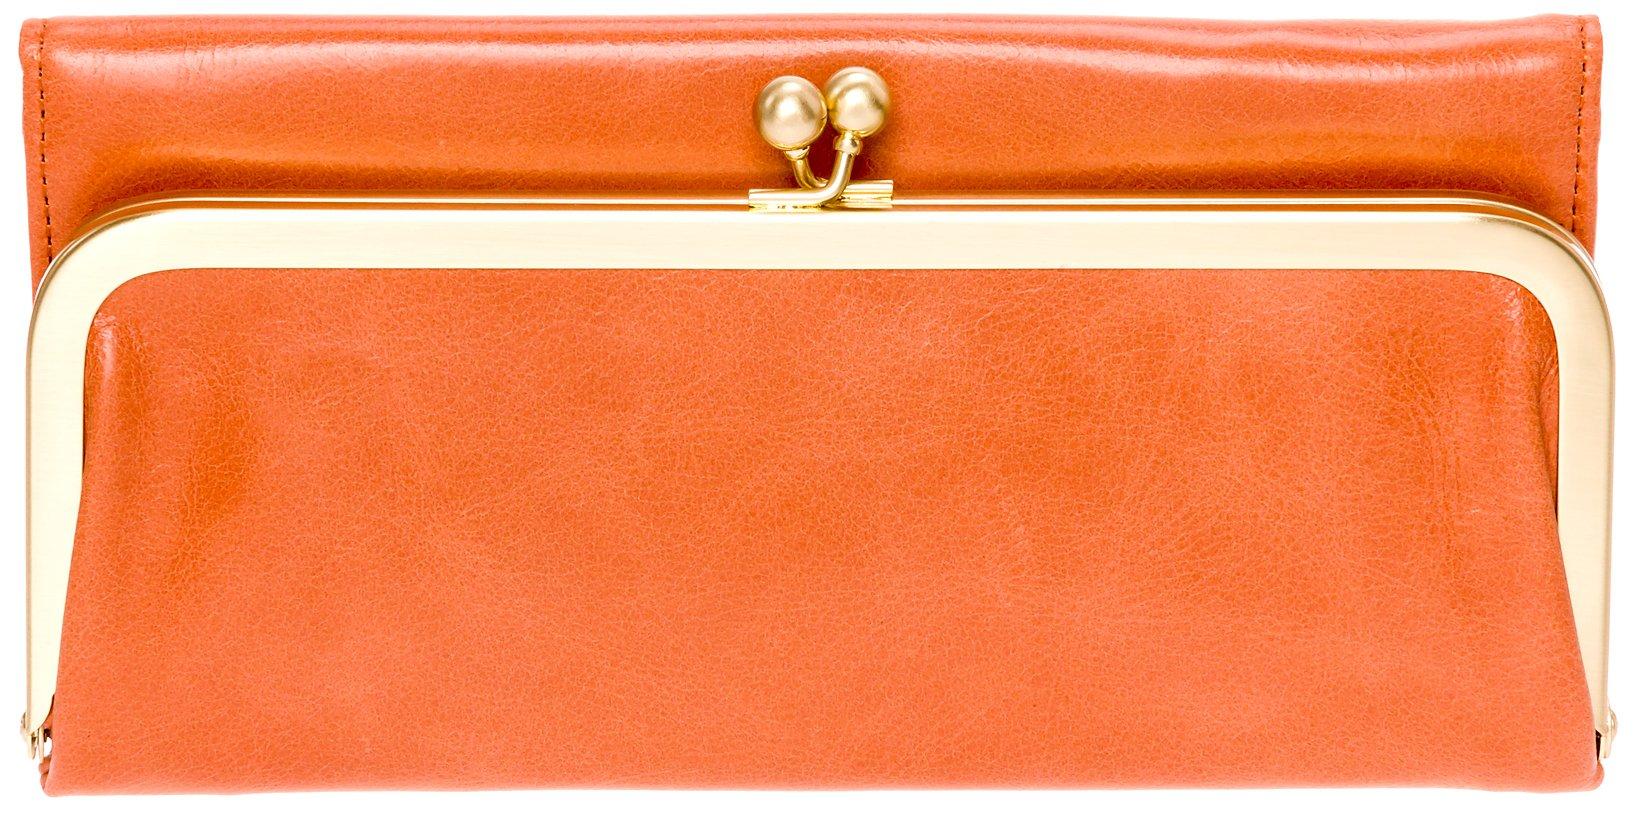 Hobo Womens Rachel Vintage Wallet Leather Clutch Purse (Persimmon)